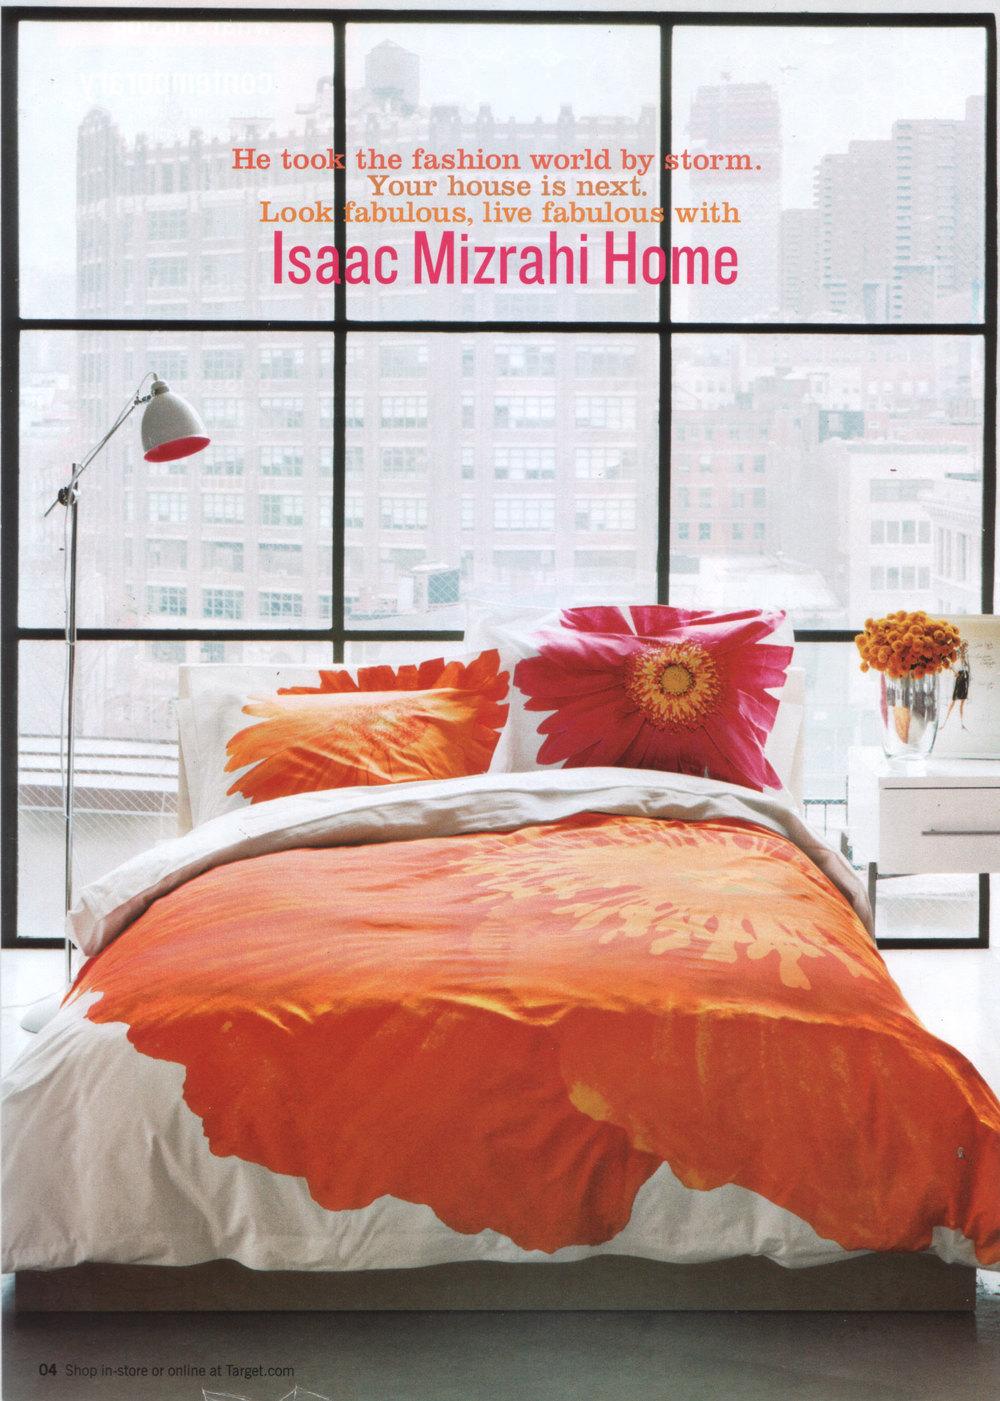 Ordinaire Home Collection For Target / Isaac Mizrahi